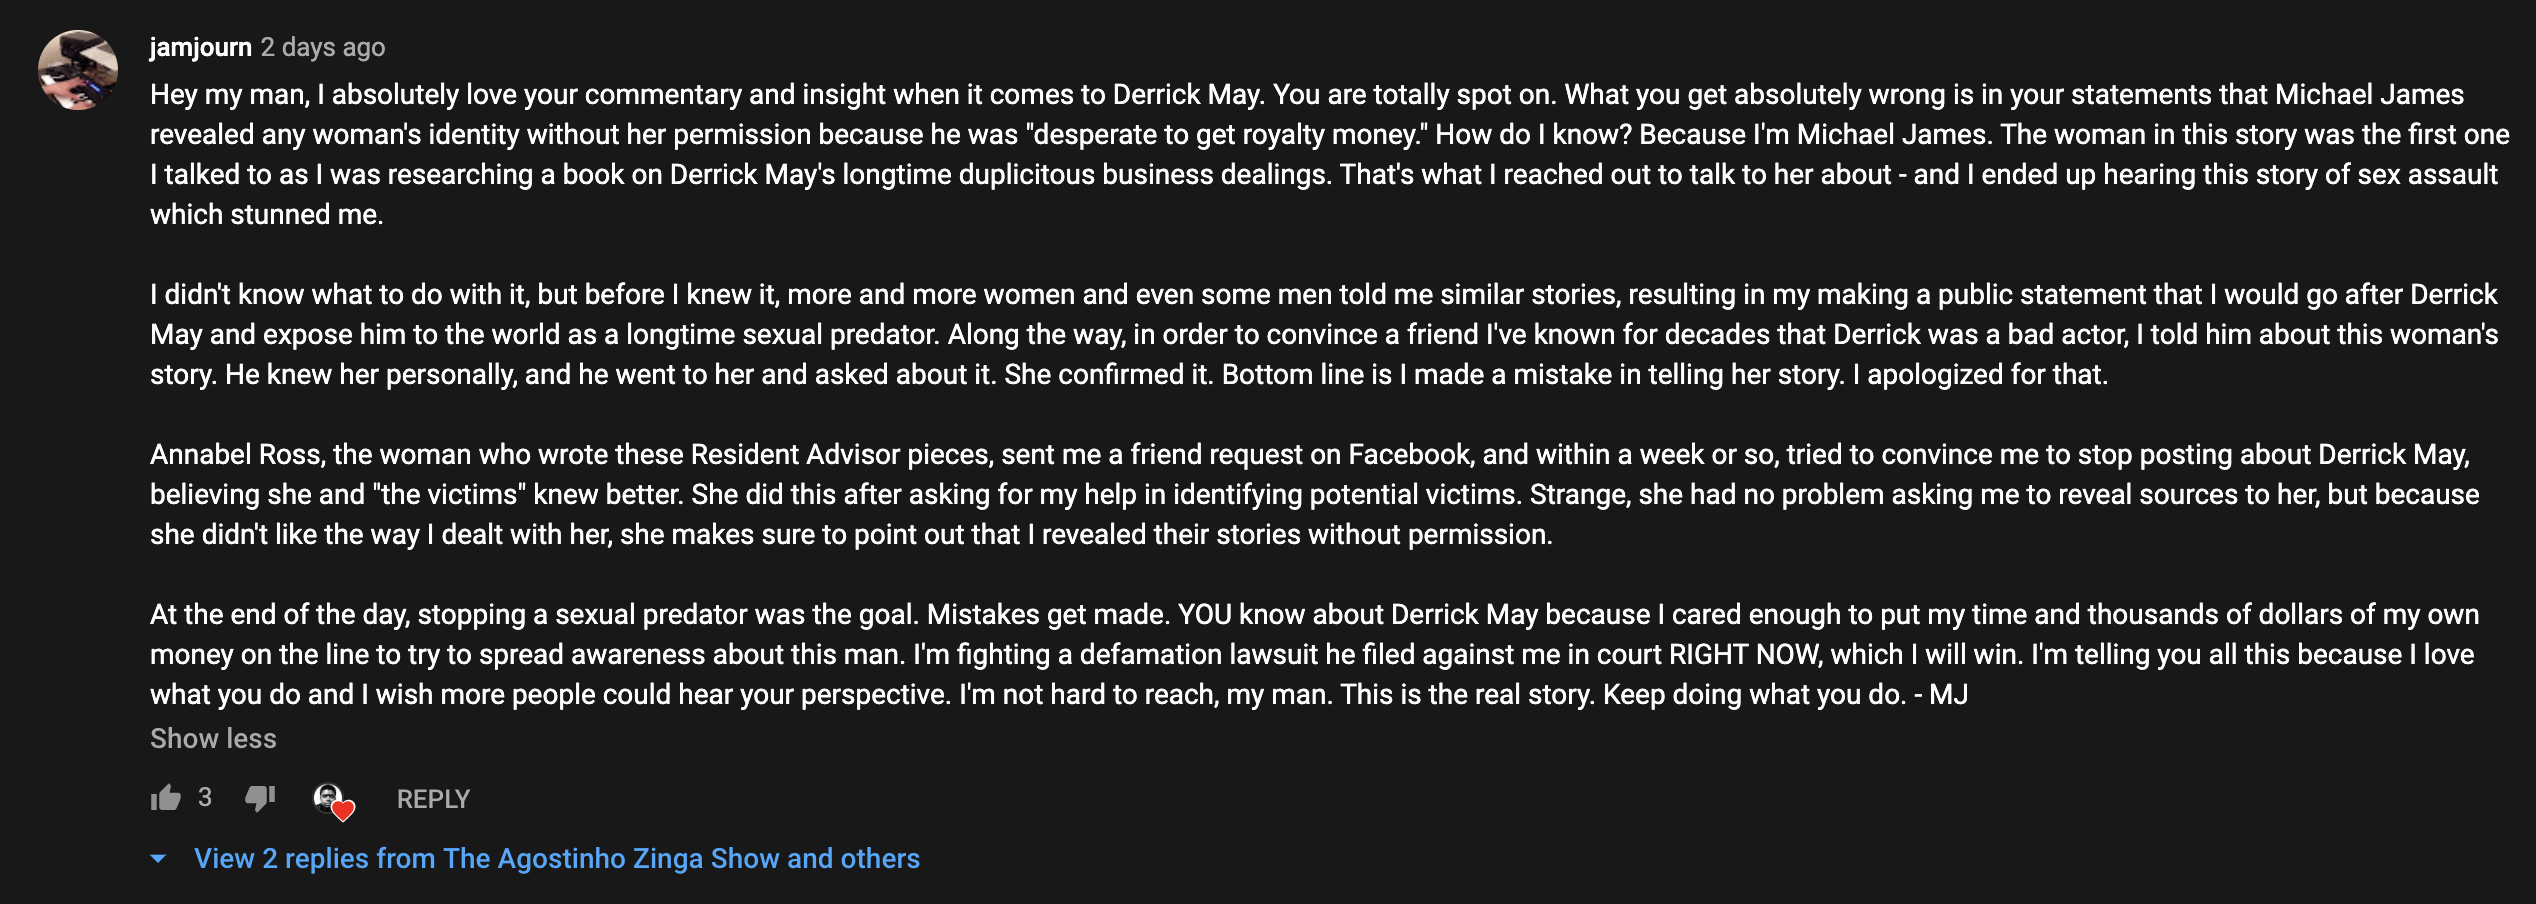 Michael James statement on YouTube